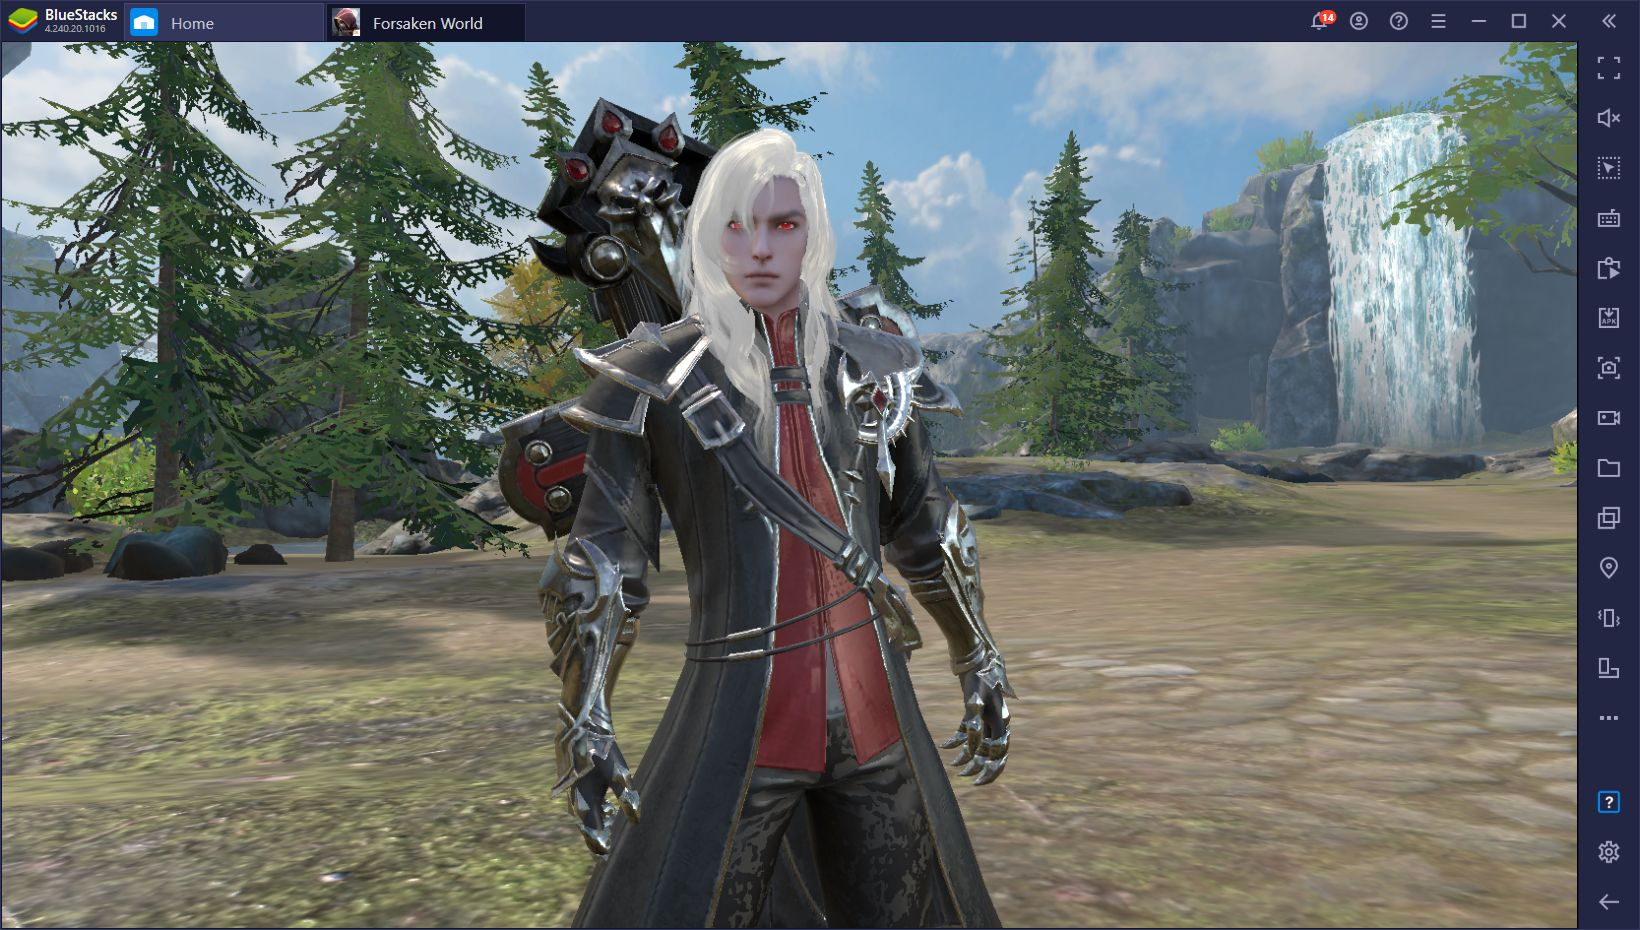 Forsaken World: Gods and Demons Now Available on PC With BlueStacks